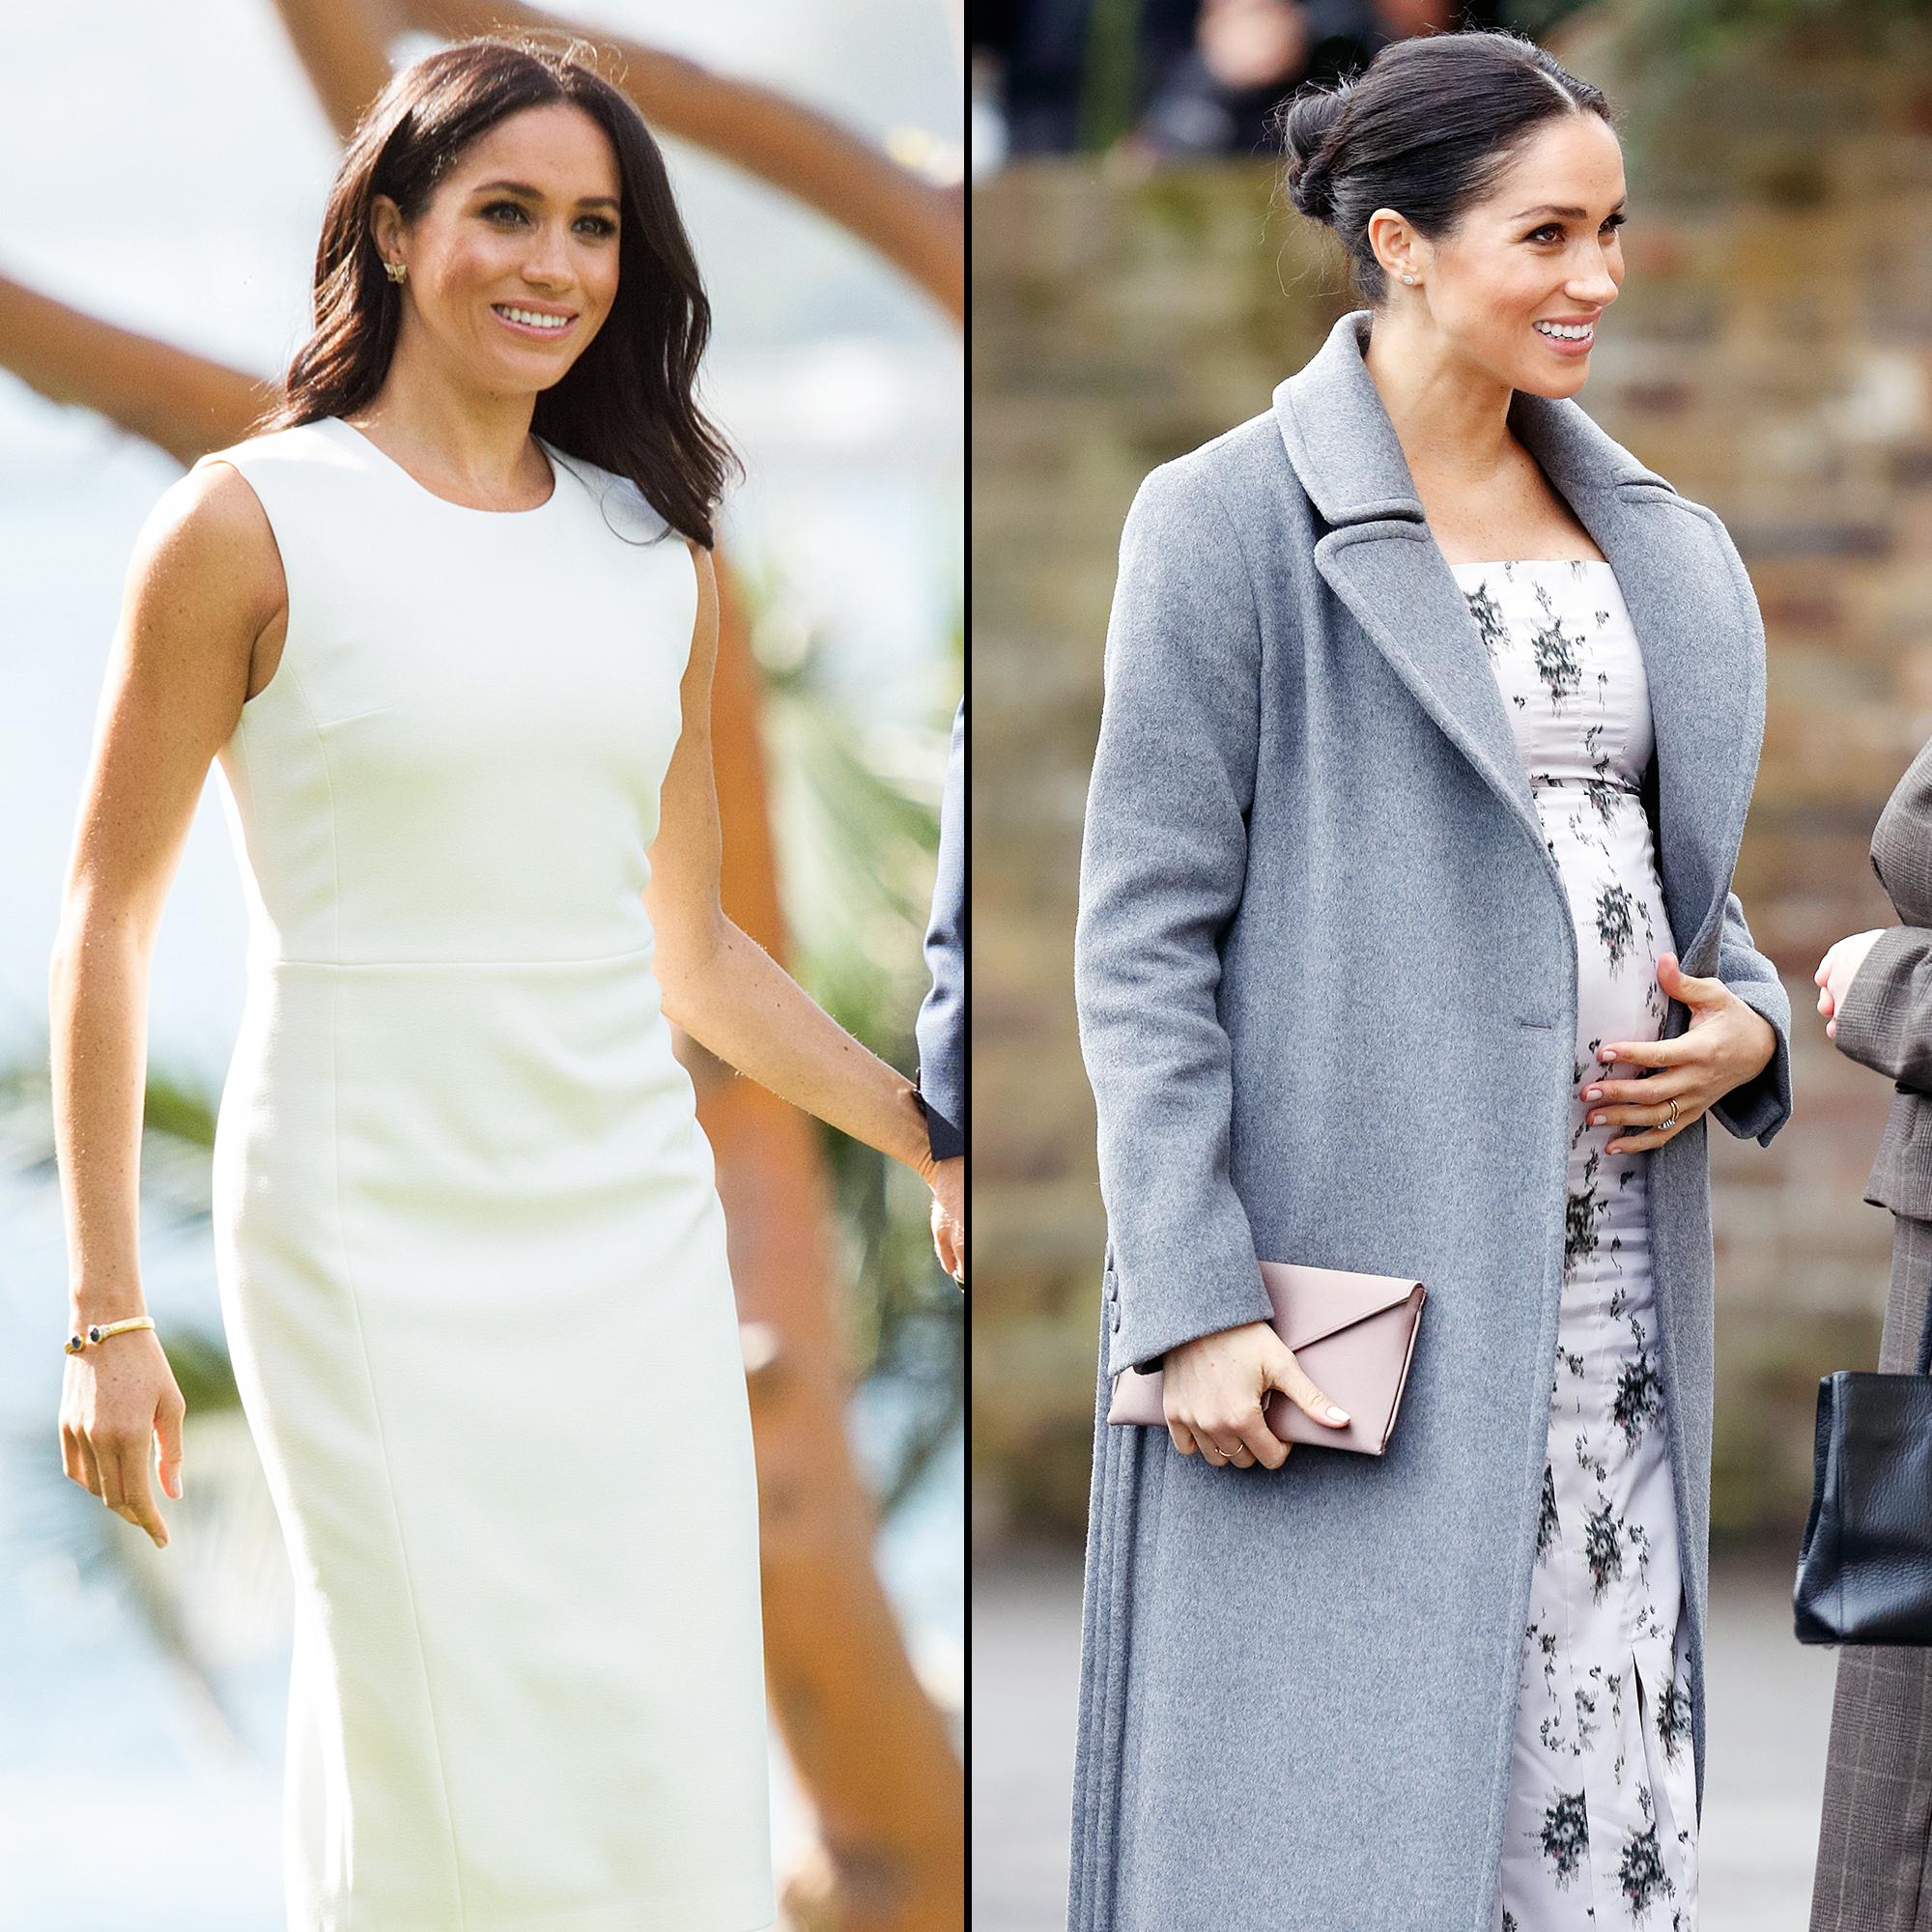 Pregnant Duchess Meghan's Baby Bump Has Really Grown